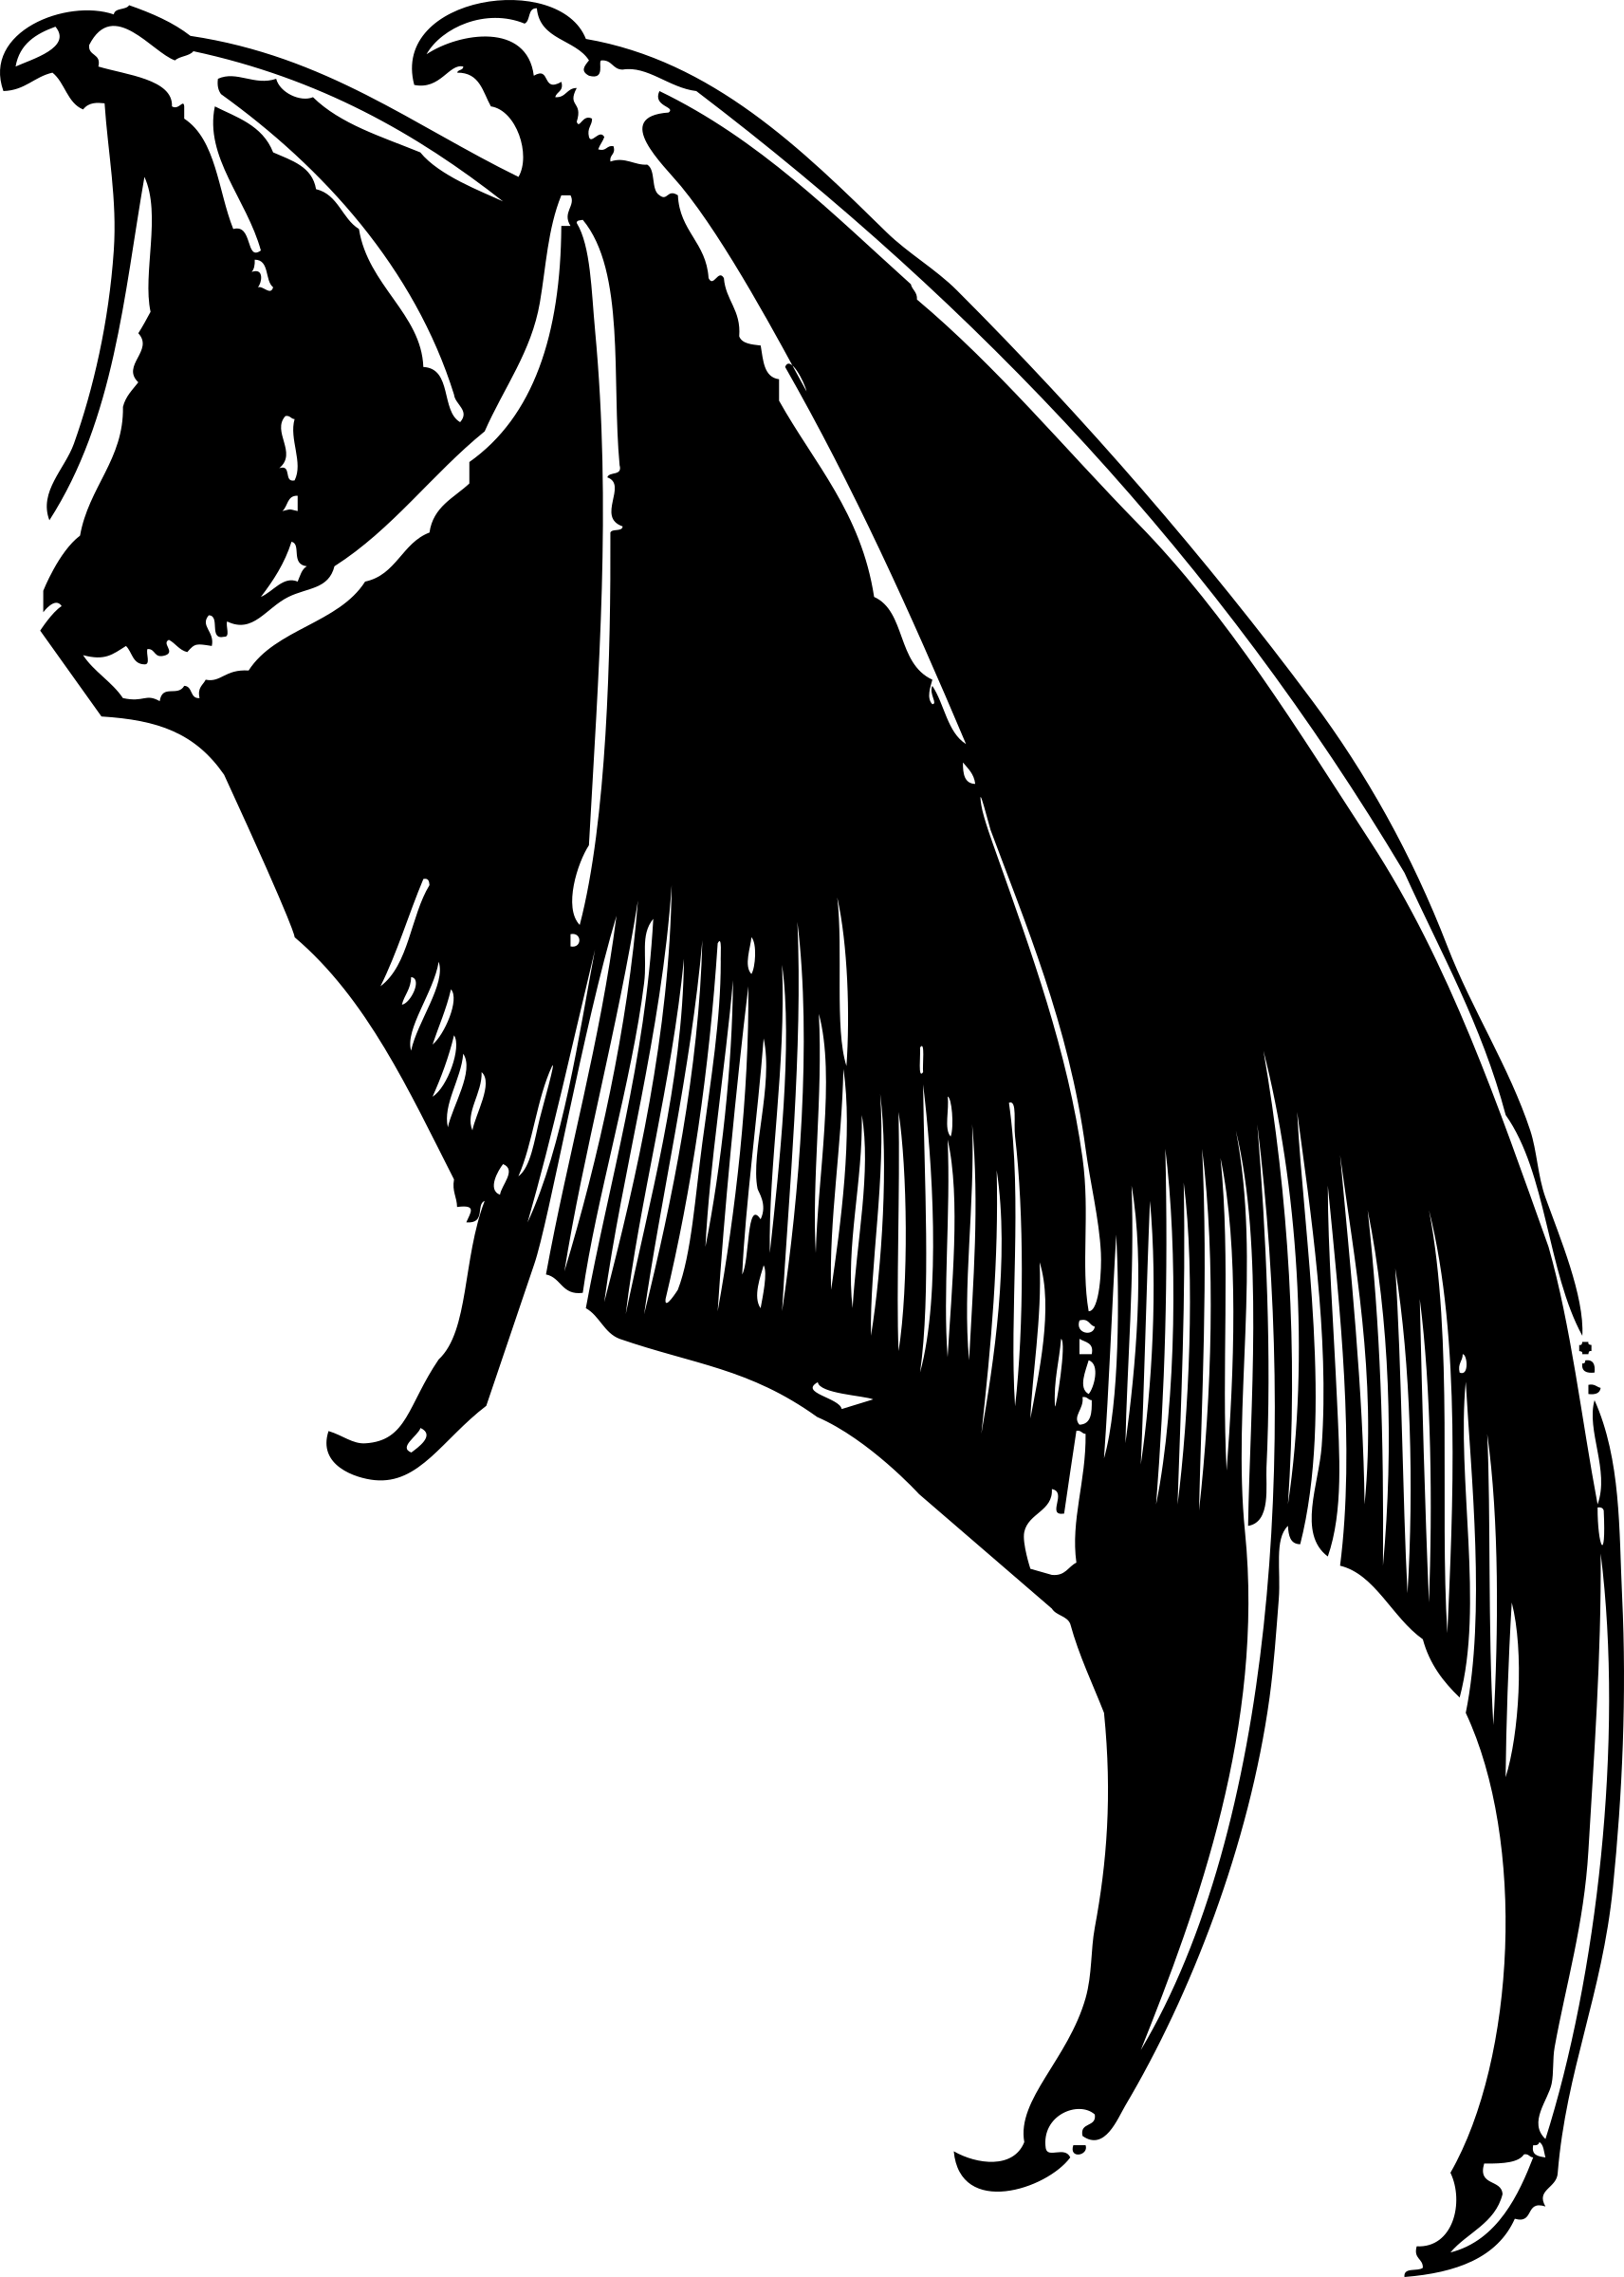 PNG Demon - 136941